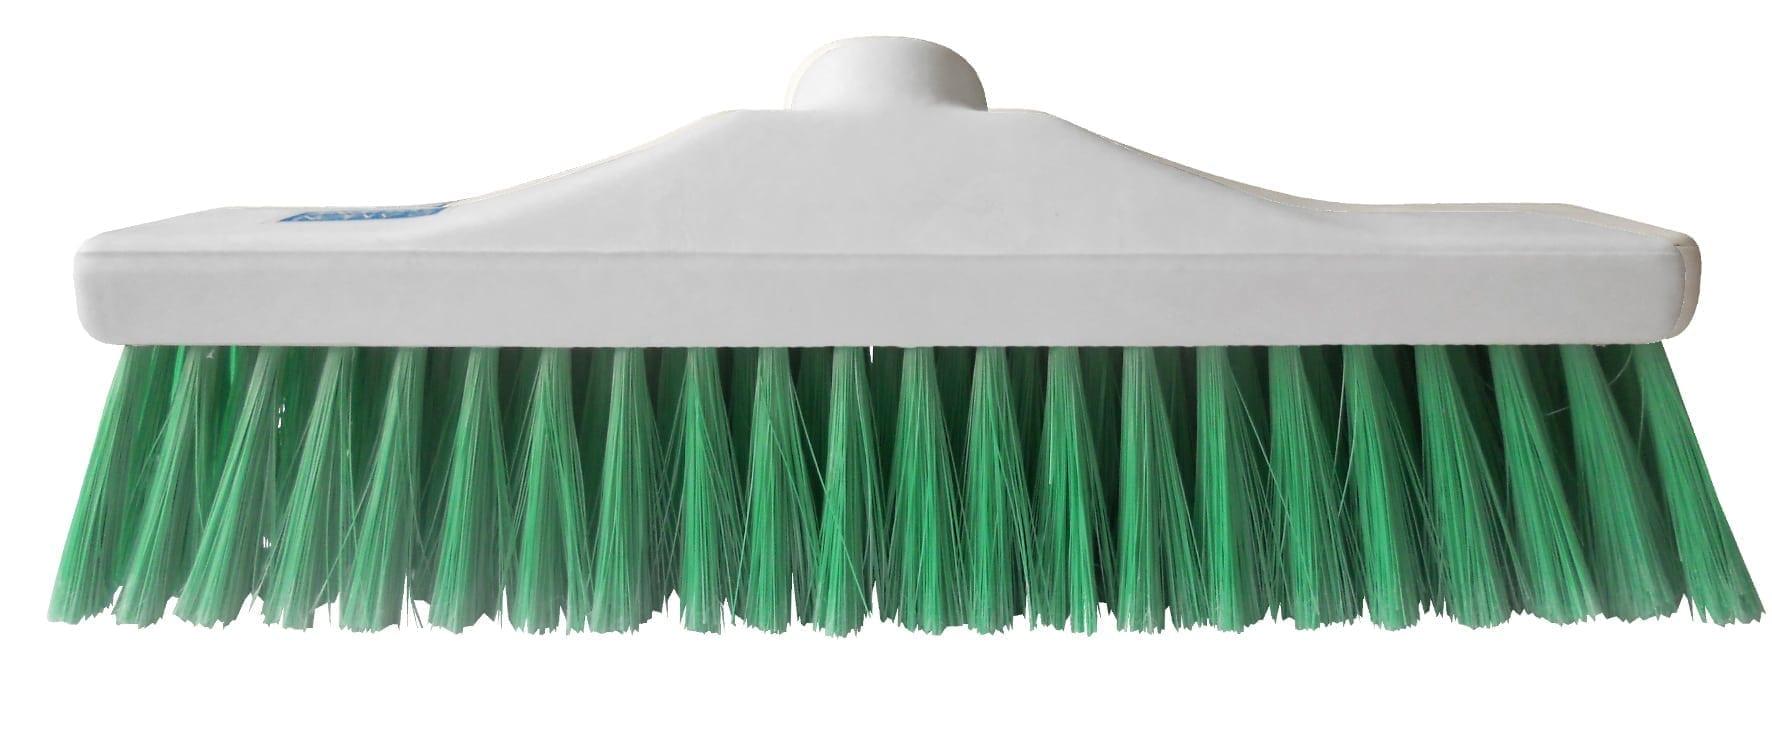 "Hygiene Brush Head 12"" - Soft Bristle - Green"